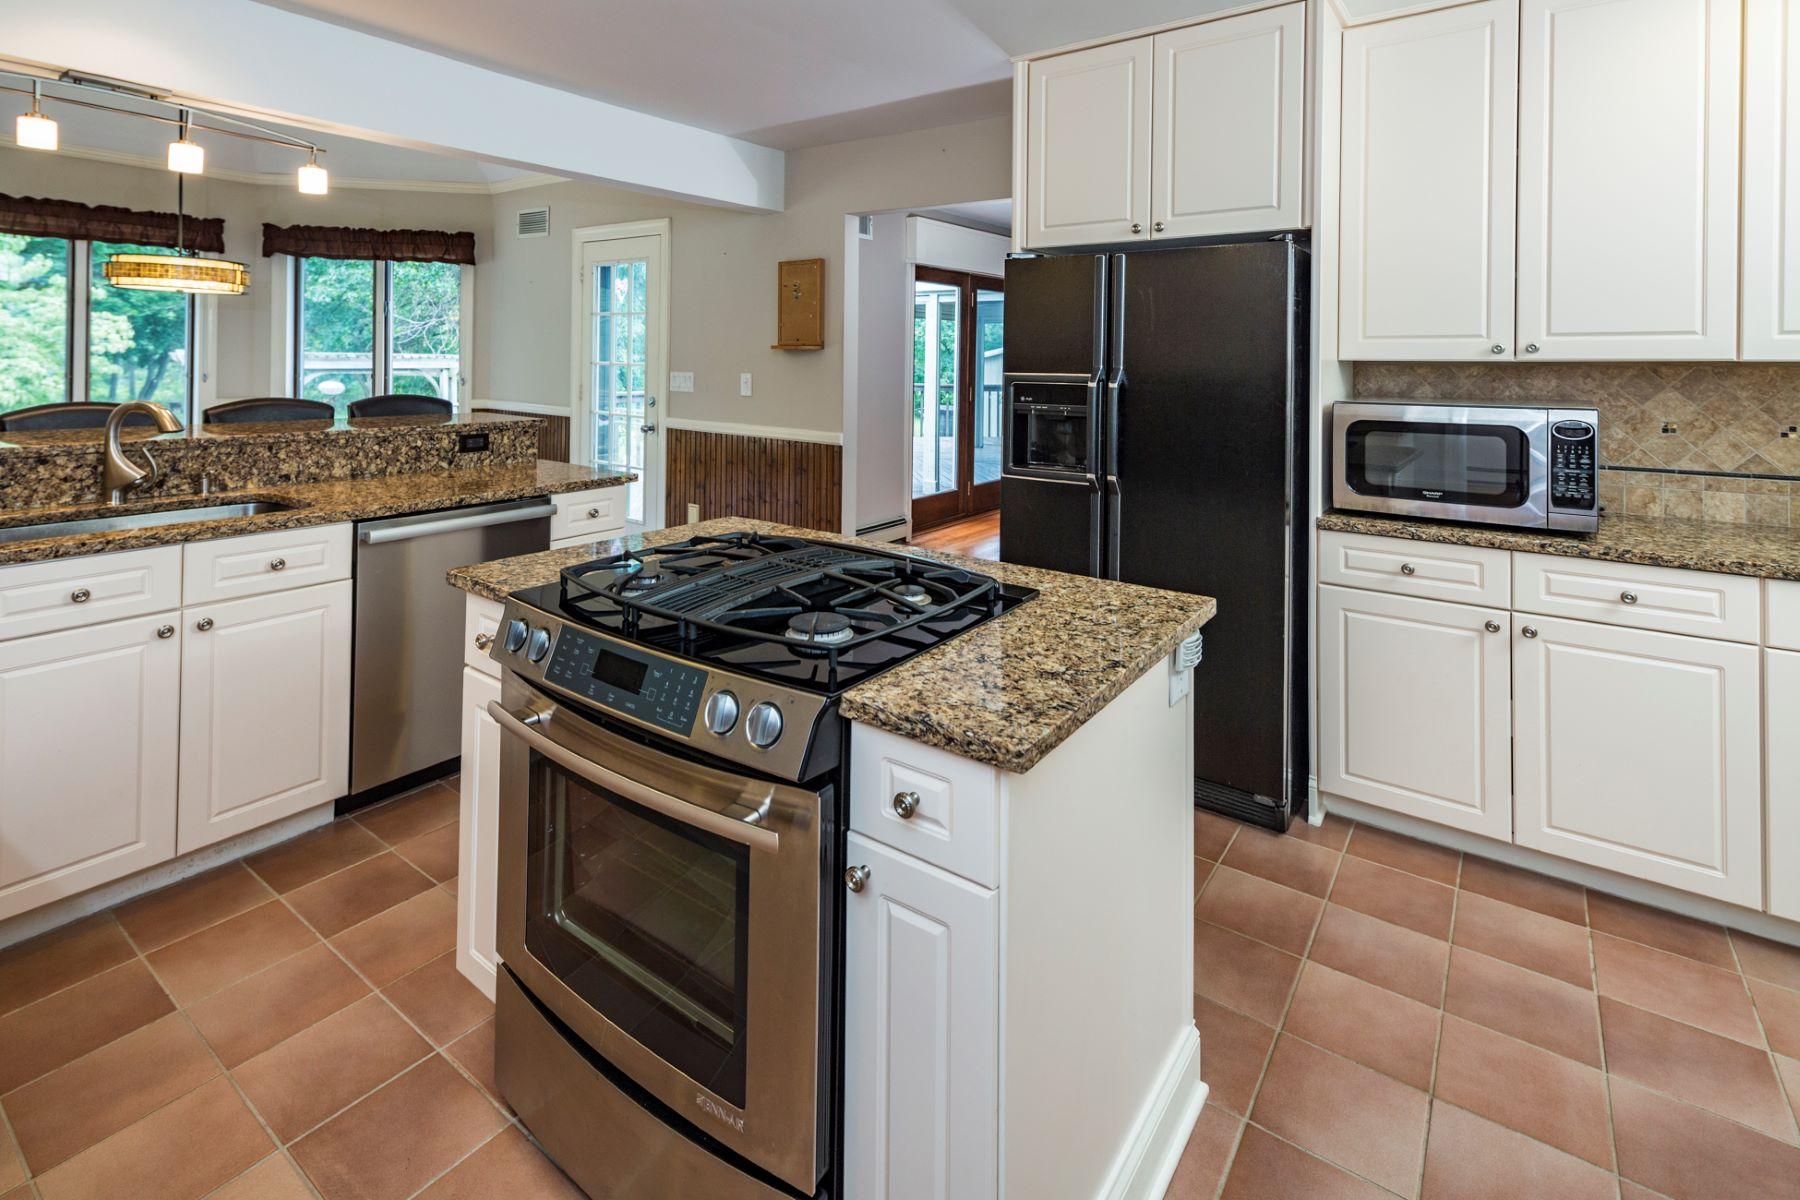 Additional photo for property listing at Custom-Built Home On An Amazing Lot 186 Harlingen Road, Belle Mead, Νιου Τζερσεϋ 08502 Ηνωμένες Πολιτείες